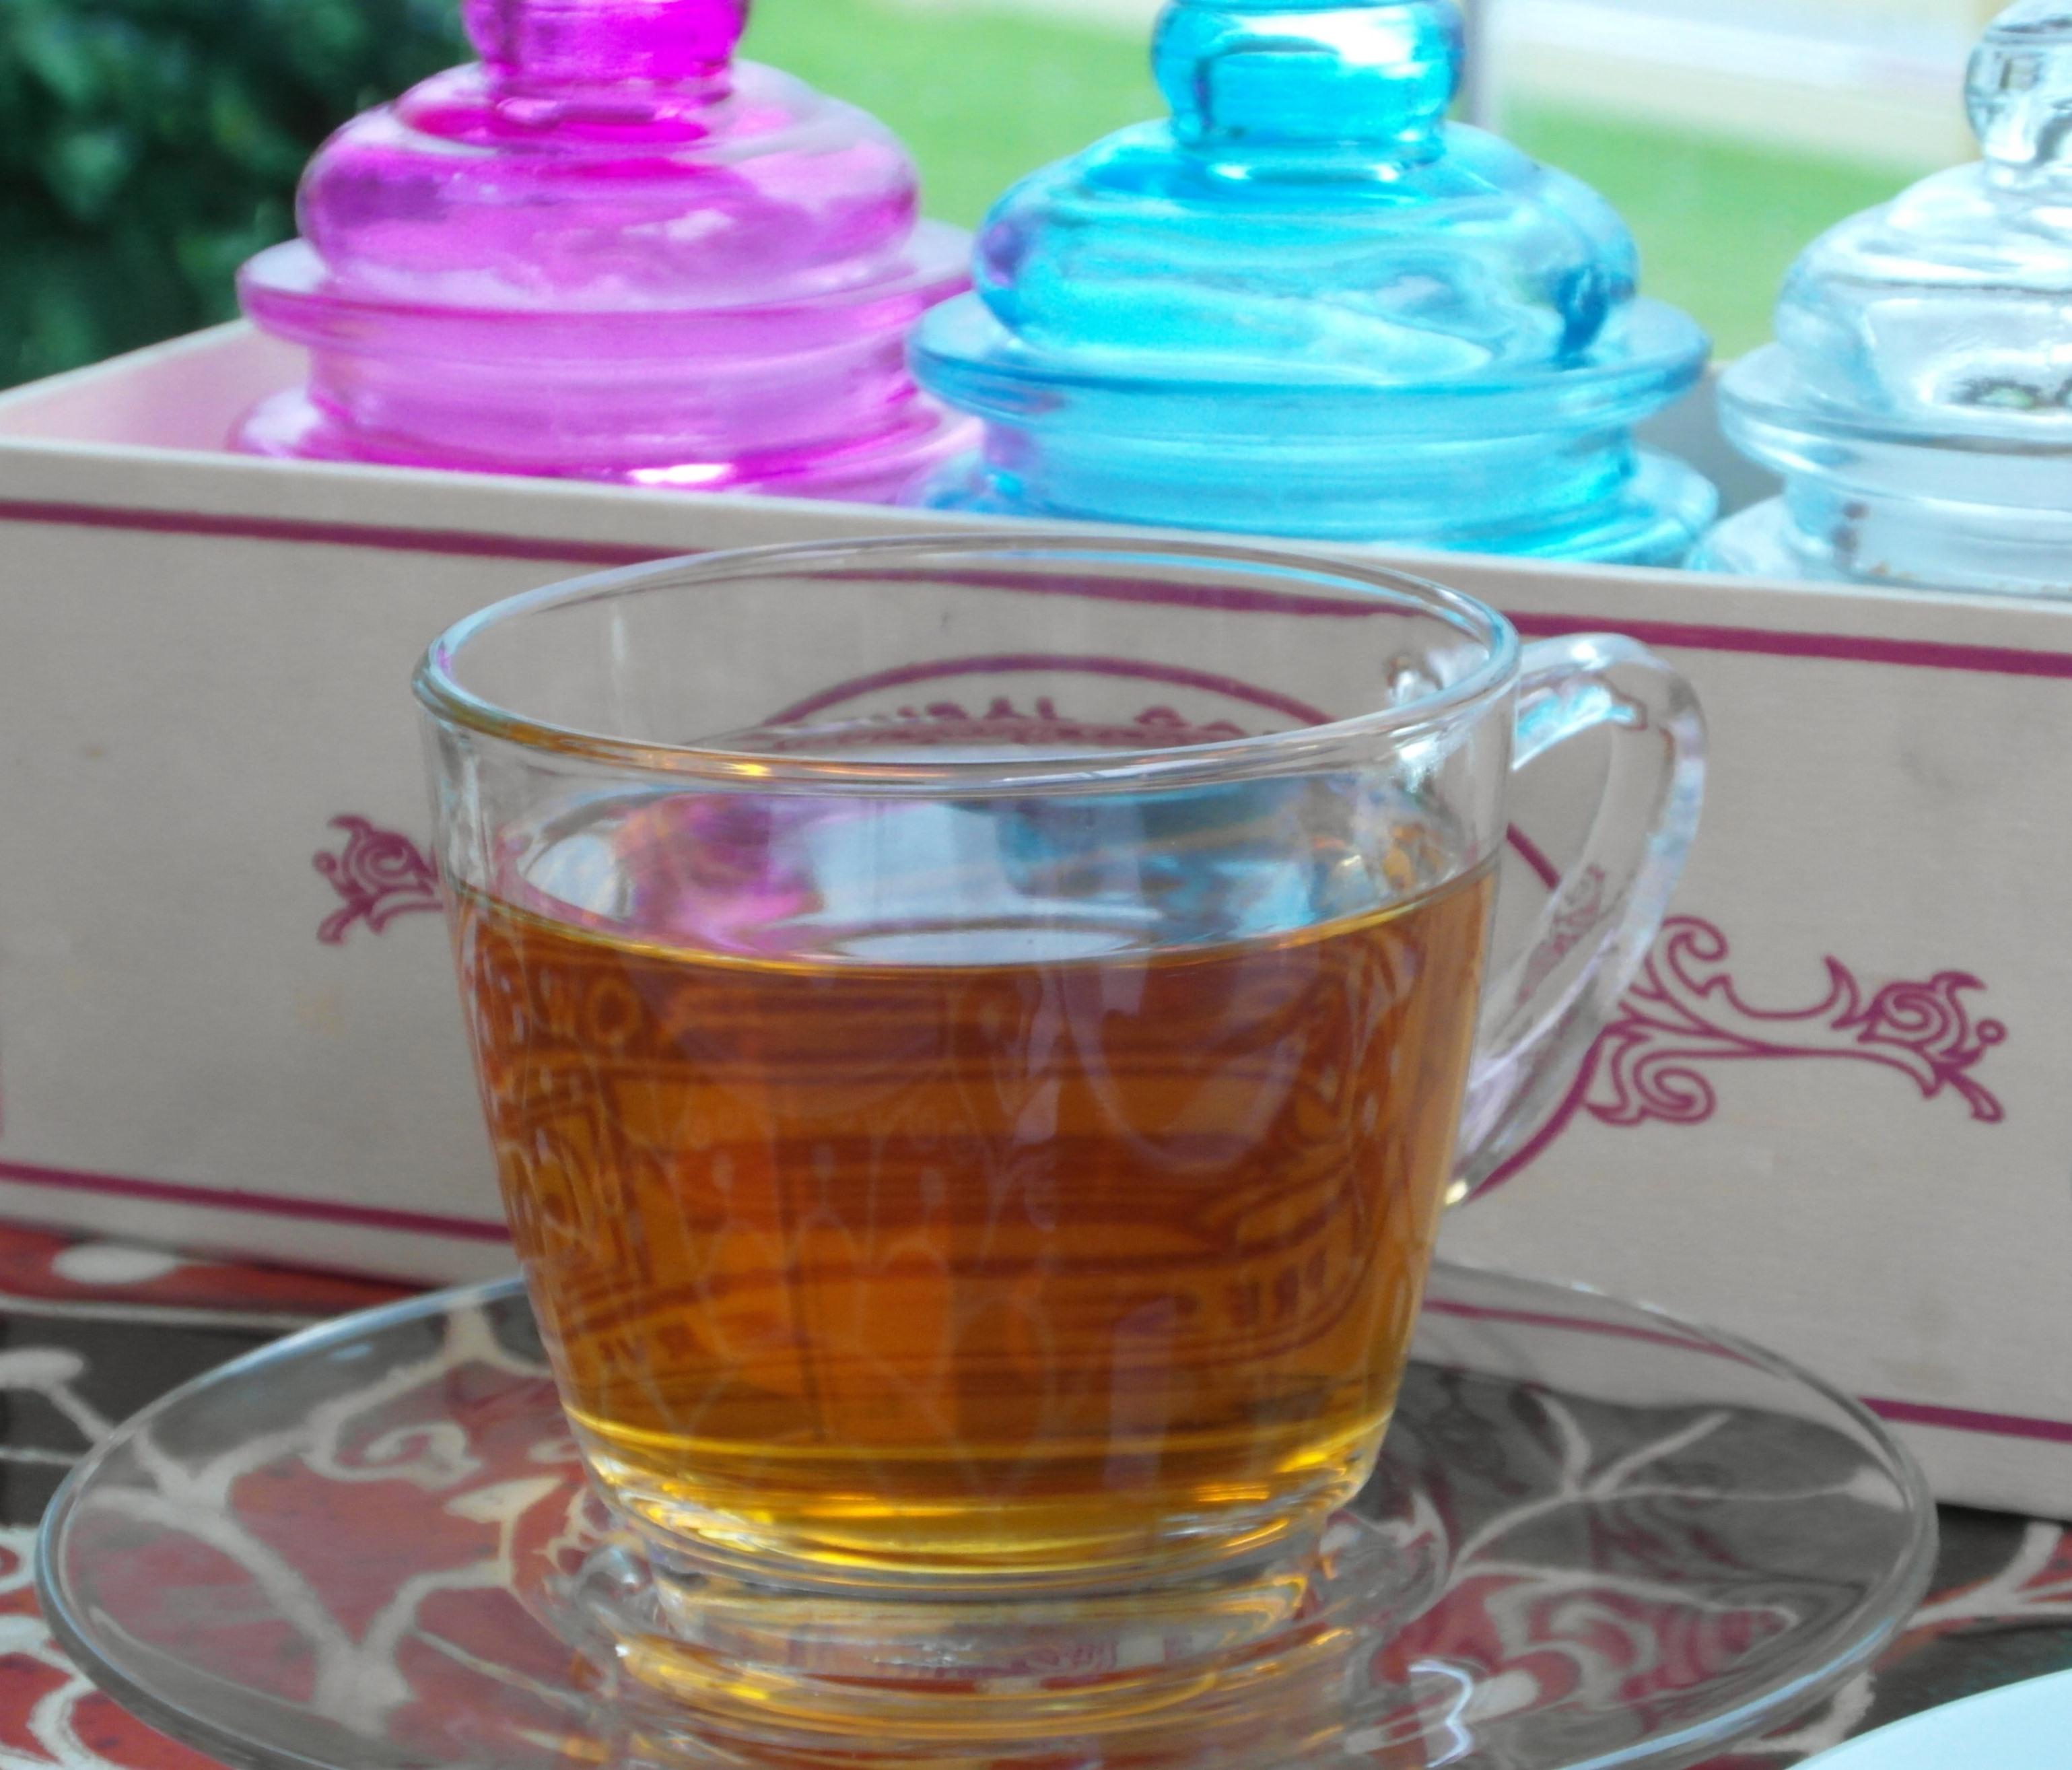 Jasmine Tea, Asian, Healthy, Tea, Sugar, HQ Photo